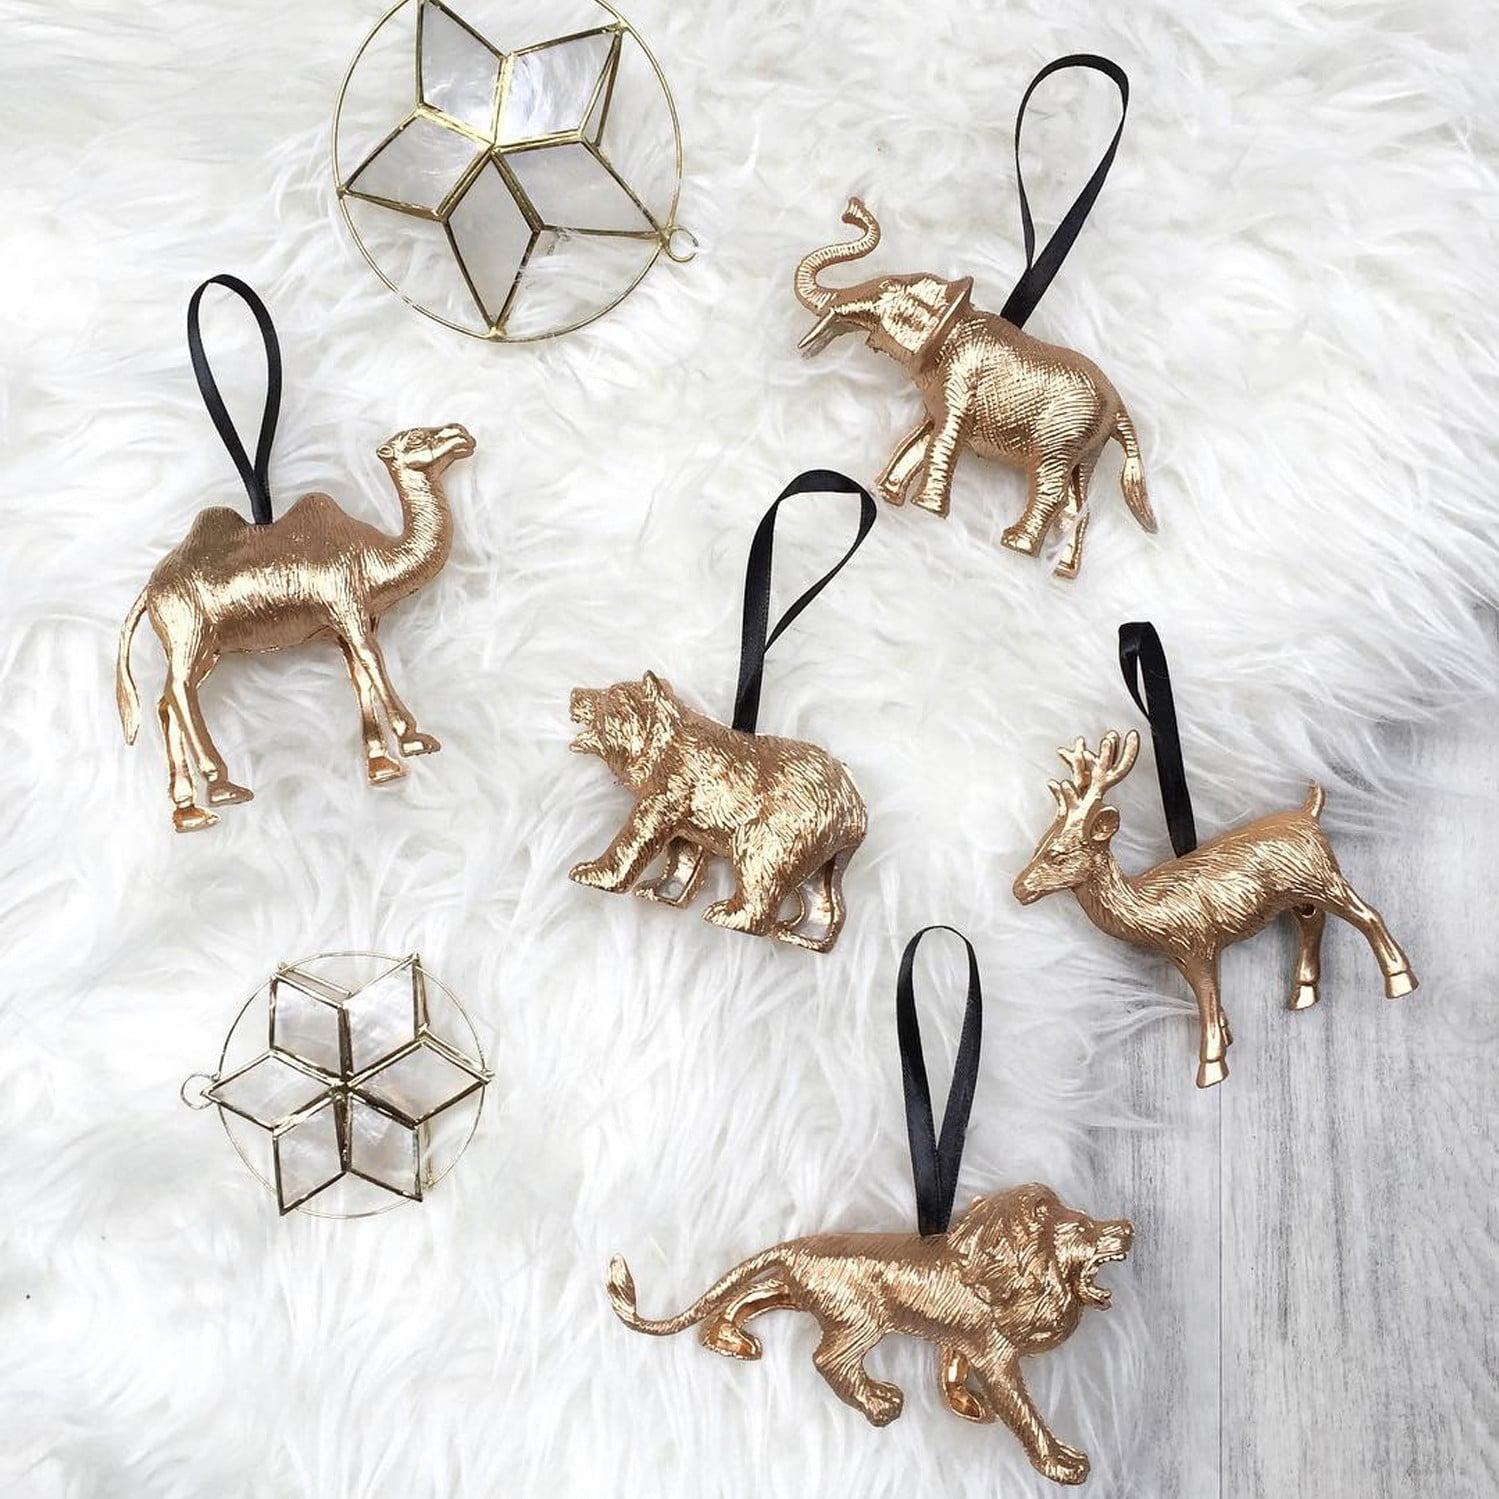 diy christmas ornaments popsugar smart living - Handcrafted Christmas Ornaments